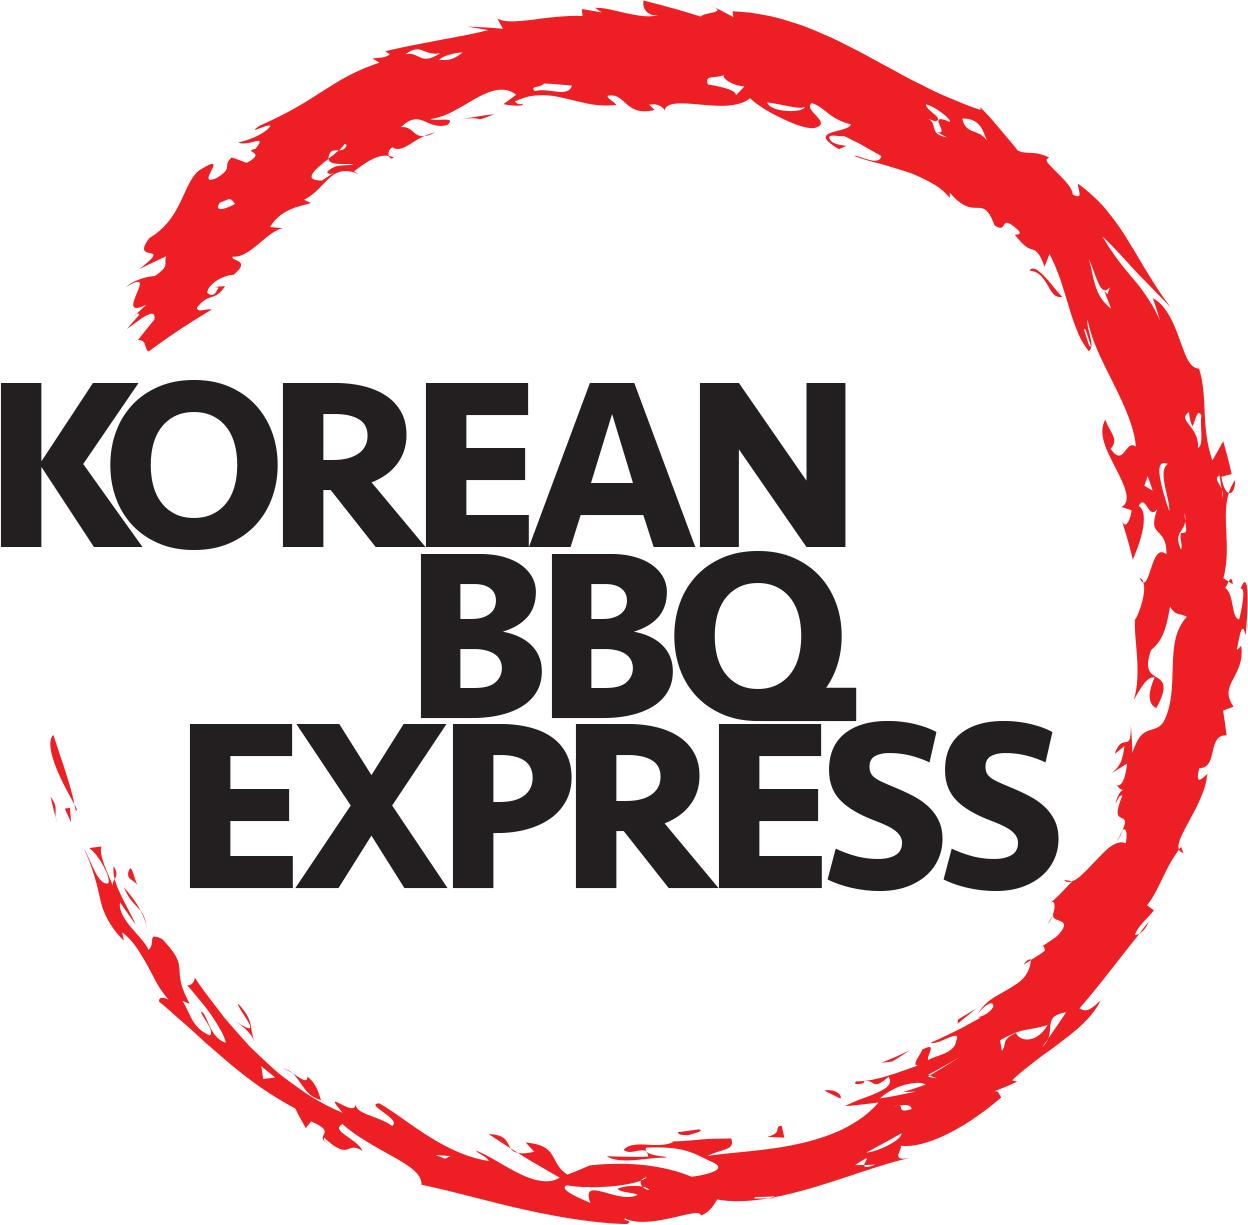 Korean BBQ Express